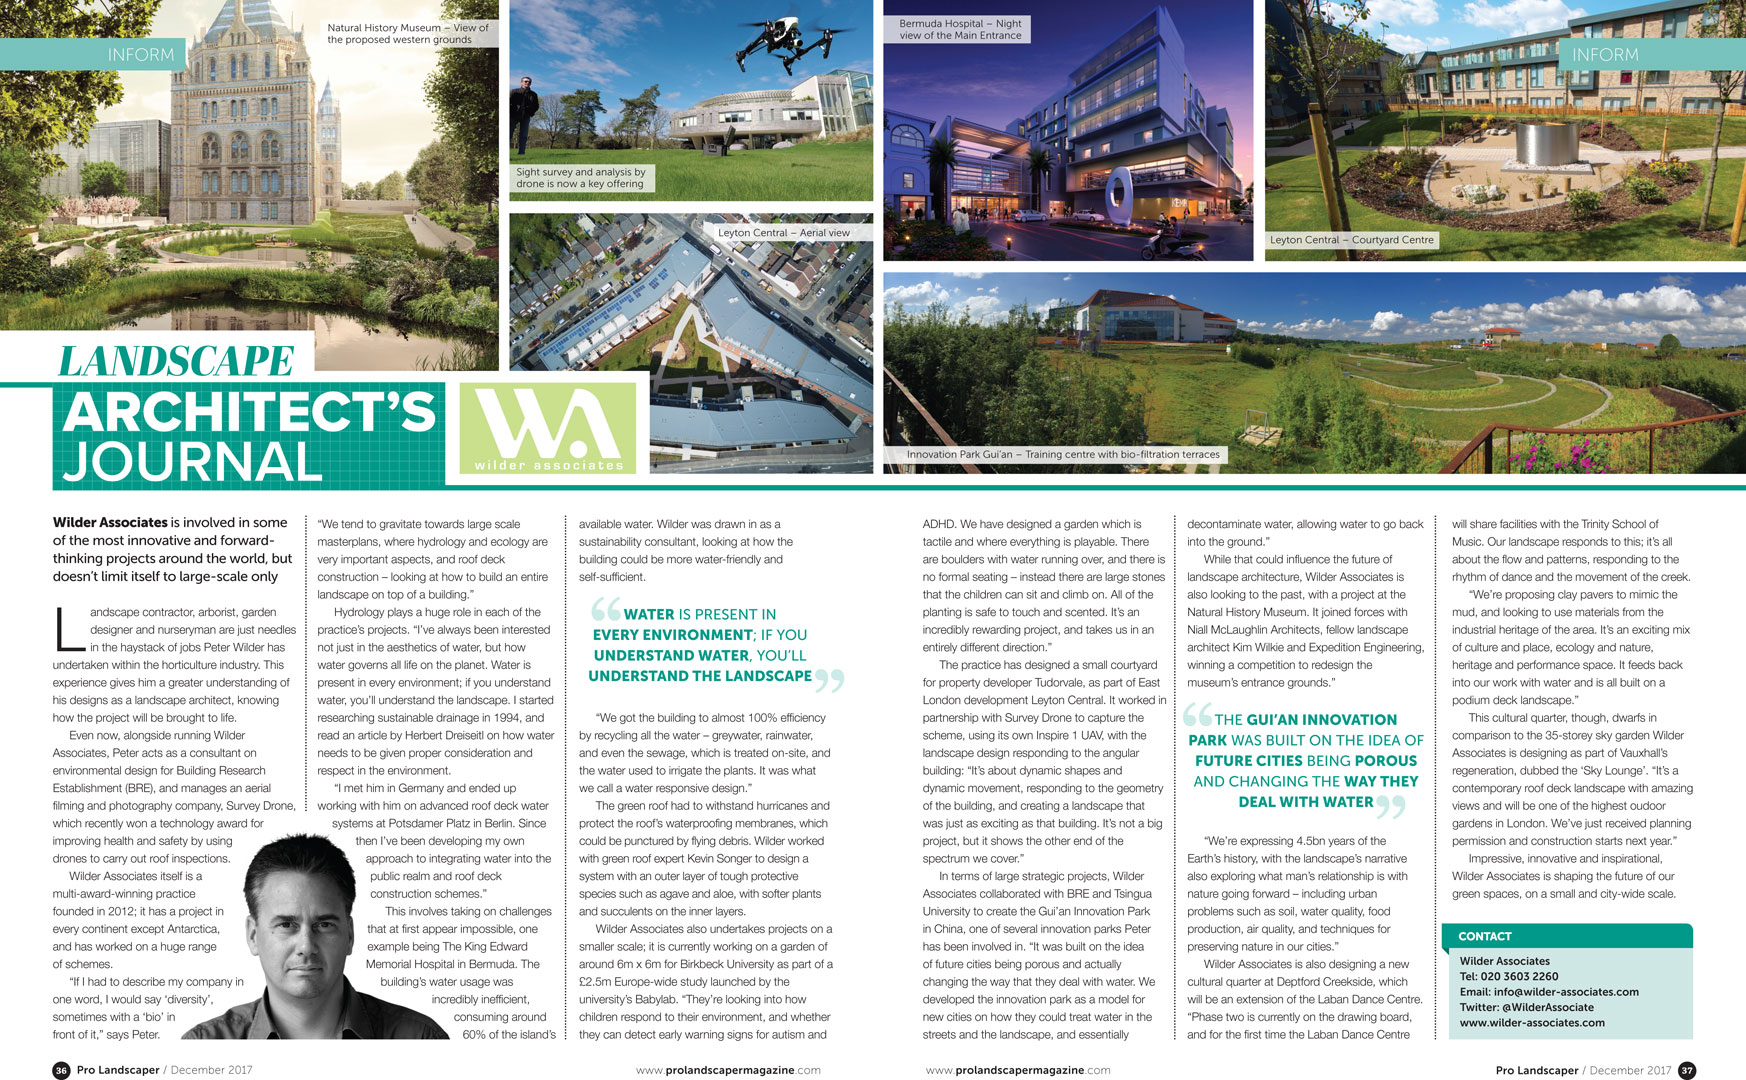 Pro-Landscaper-Wilder-Associates.jpg